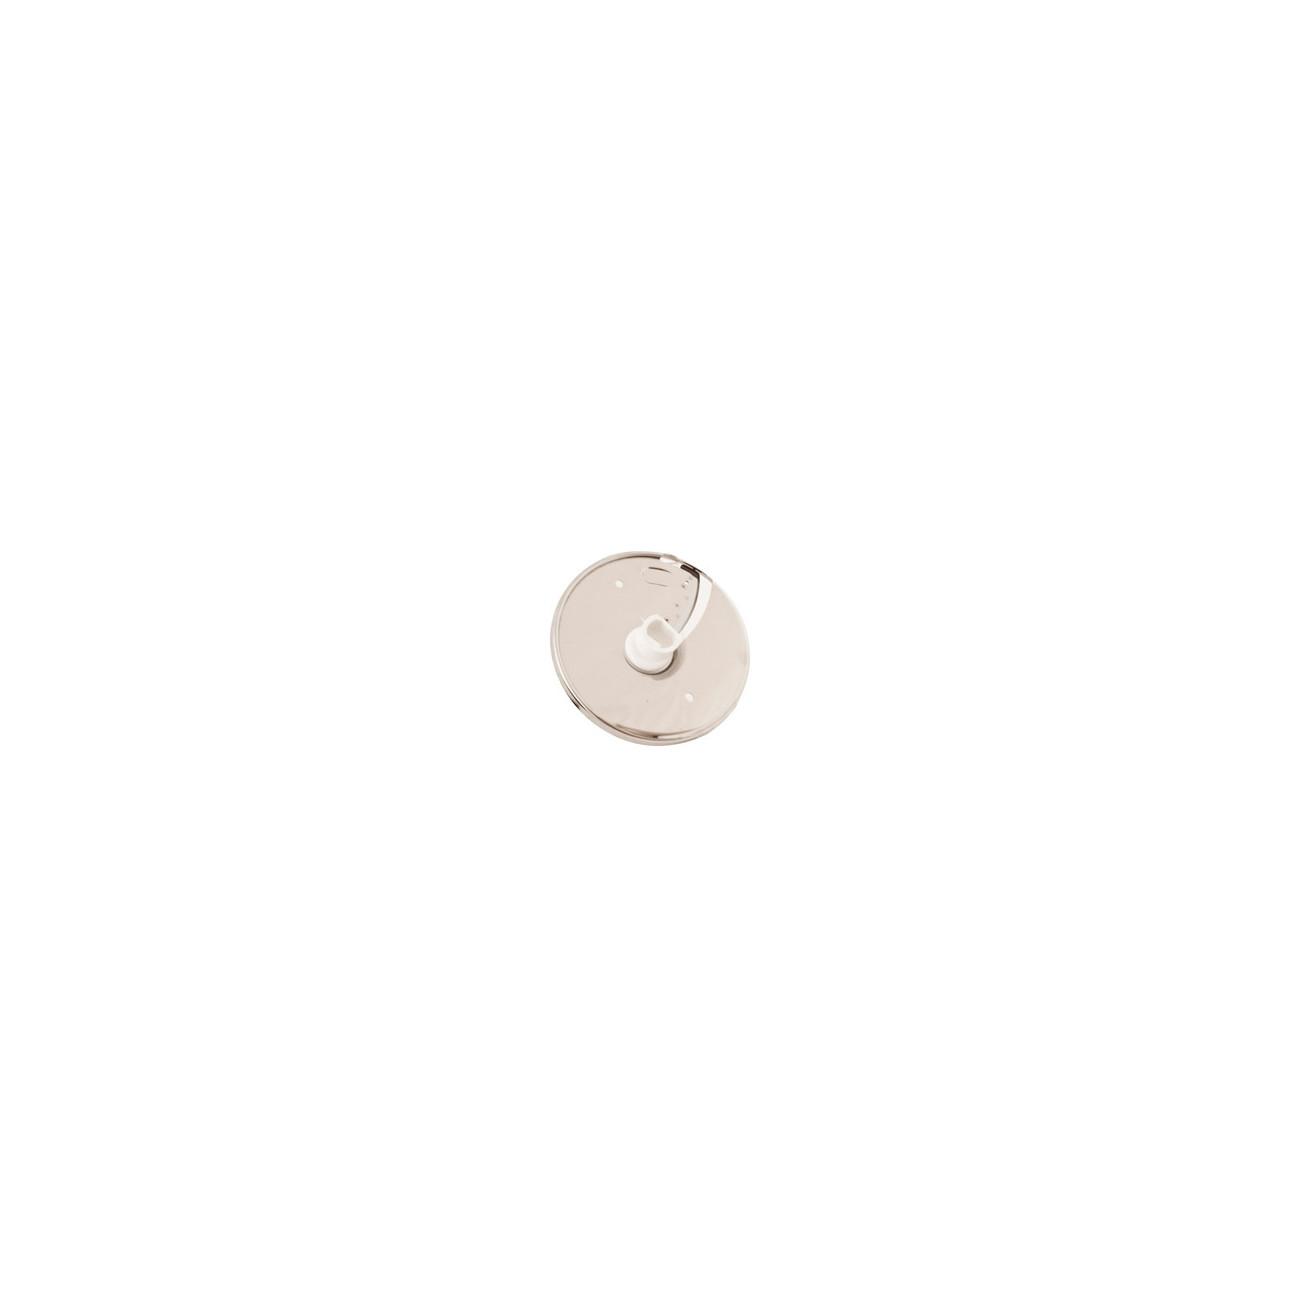 10mm Slicing Disc